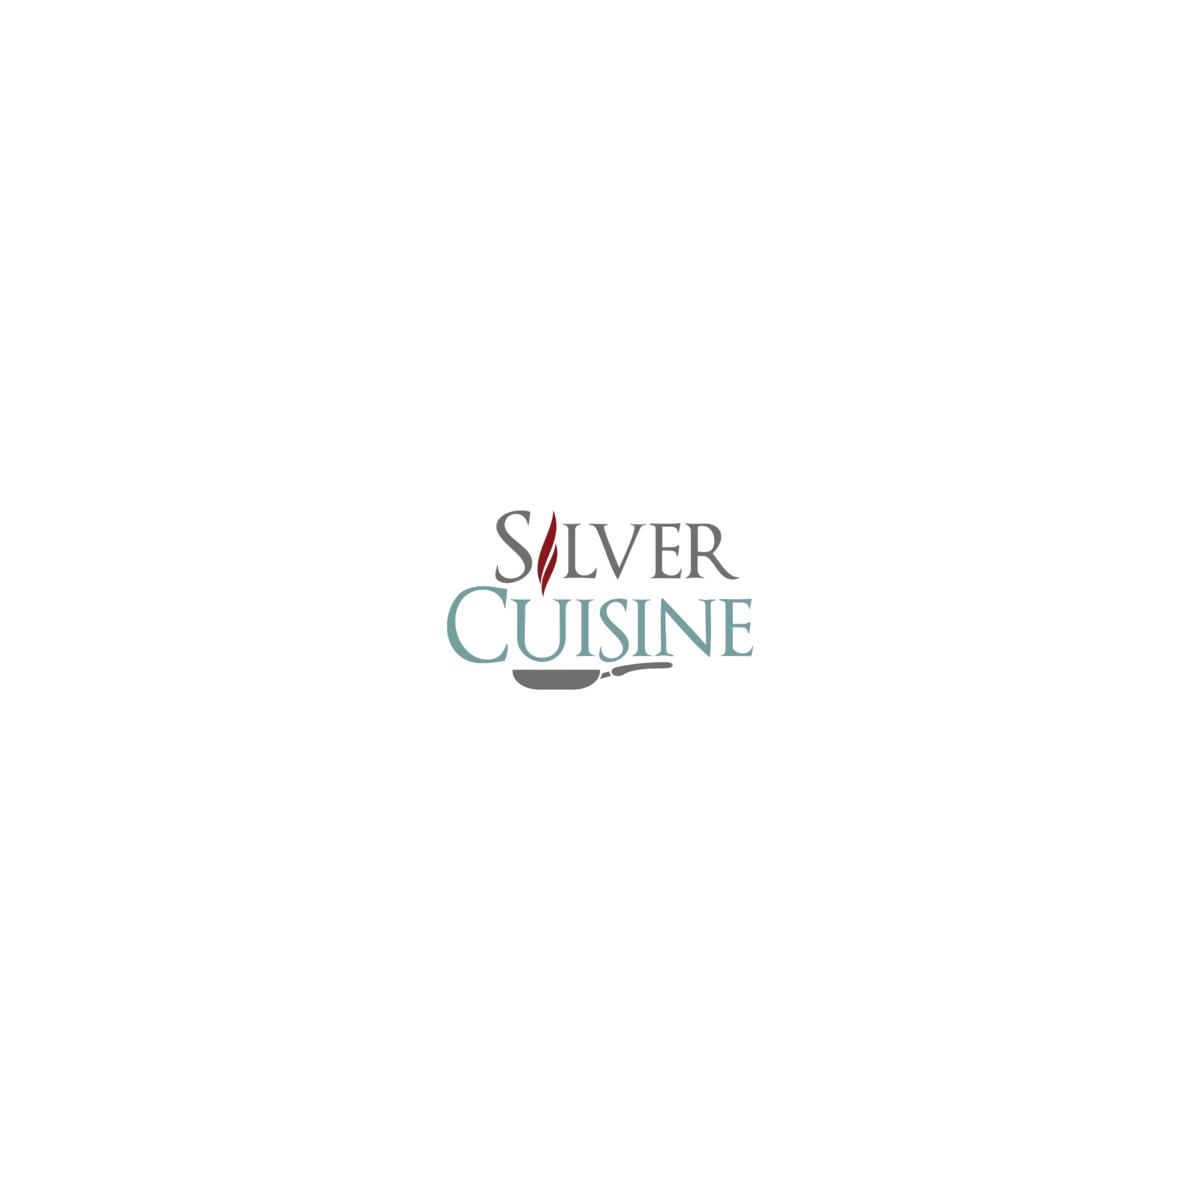 Silver Cuisine by bistroMD